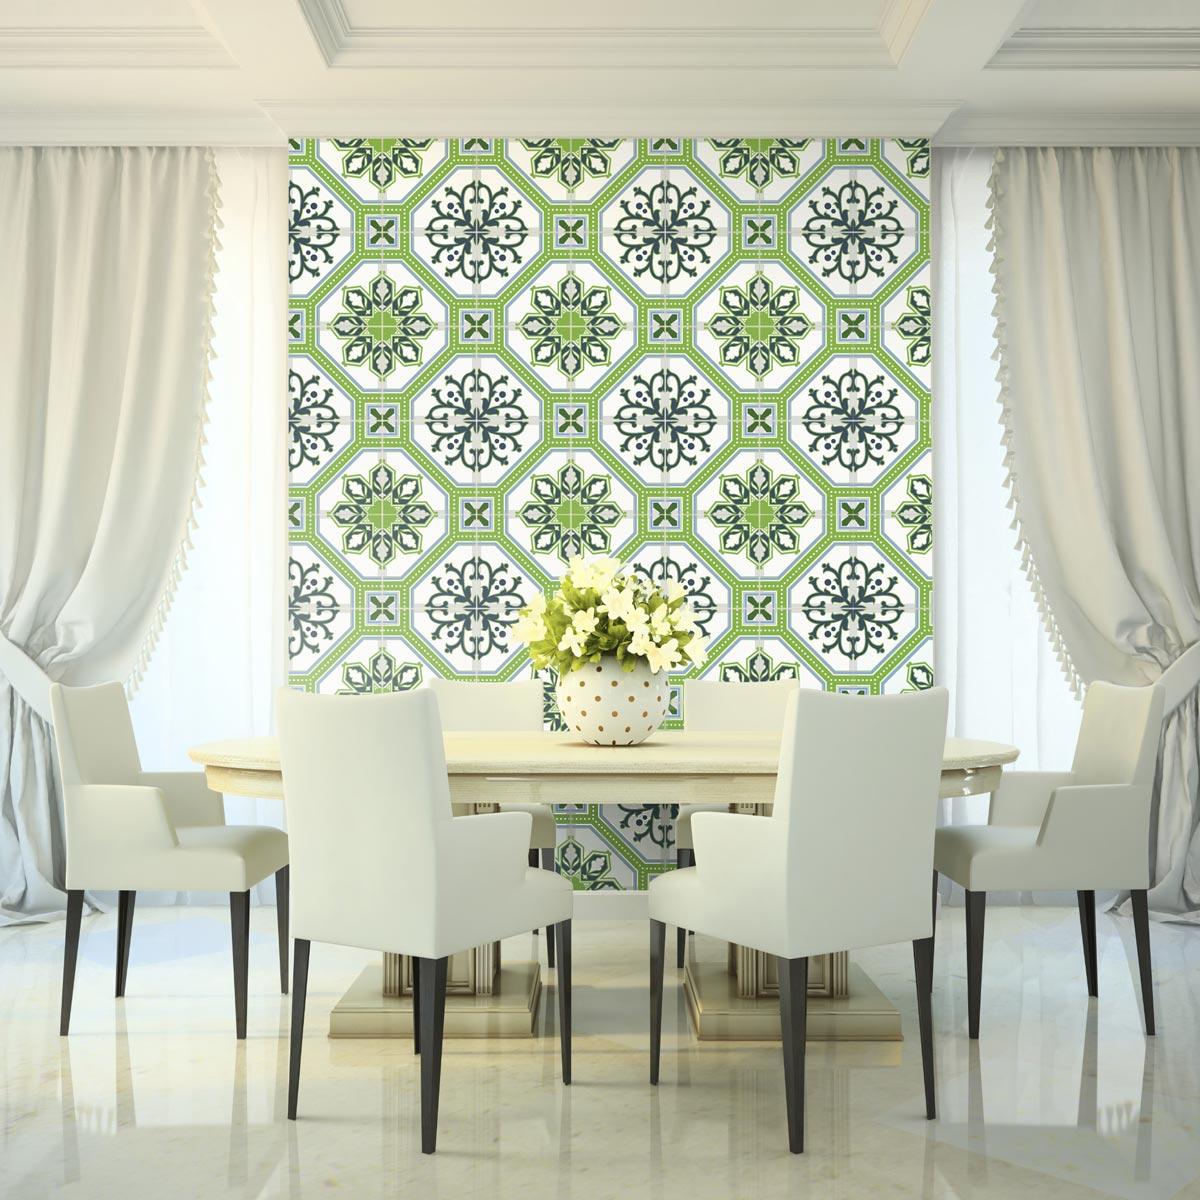 24 stickers carrelages azulejos vert lisbonne stickers. Black Bedroom Furniture Sets. Home Design Ideas